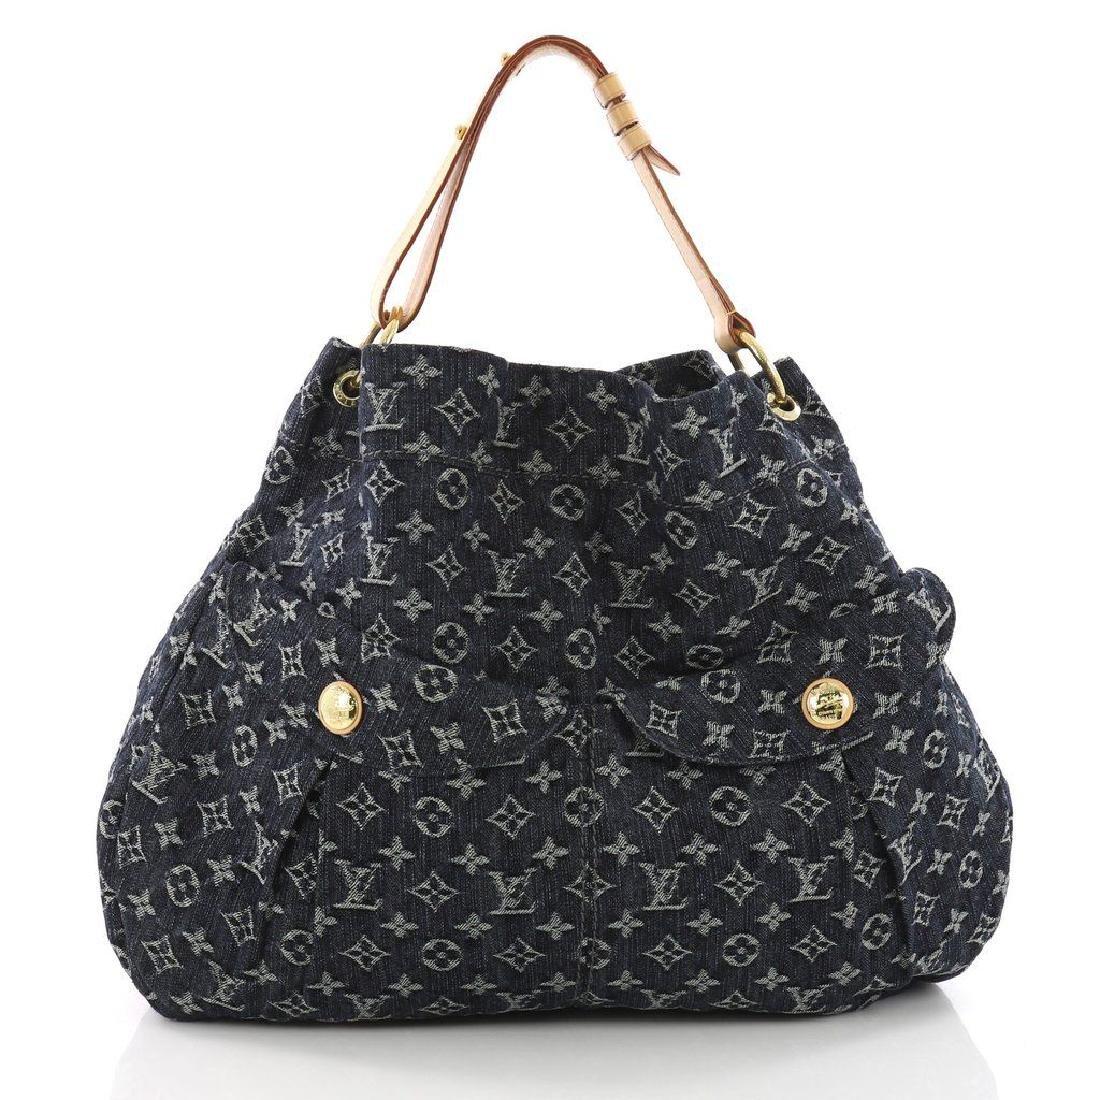 Louis Vuitton Daily Gm Jean Gris Bleu Denim Hobo Bag